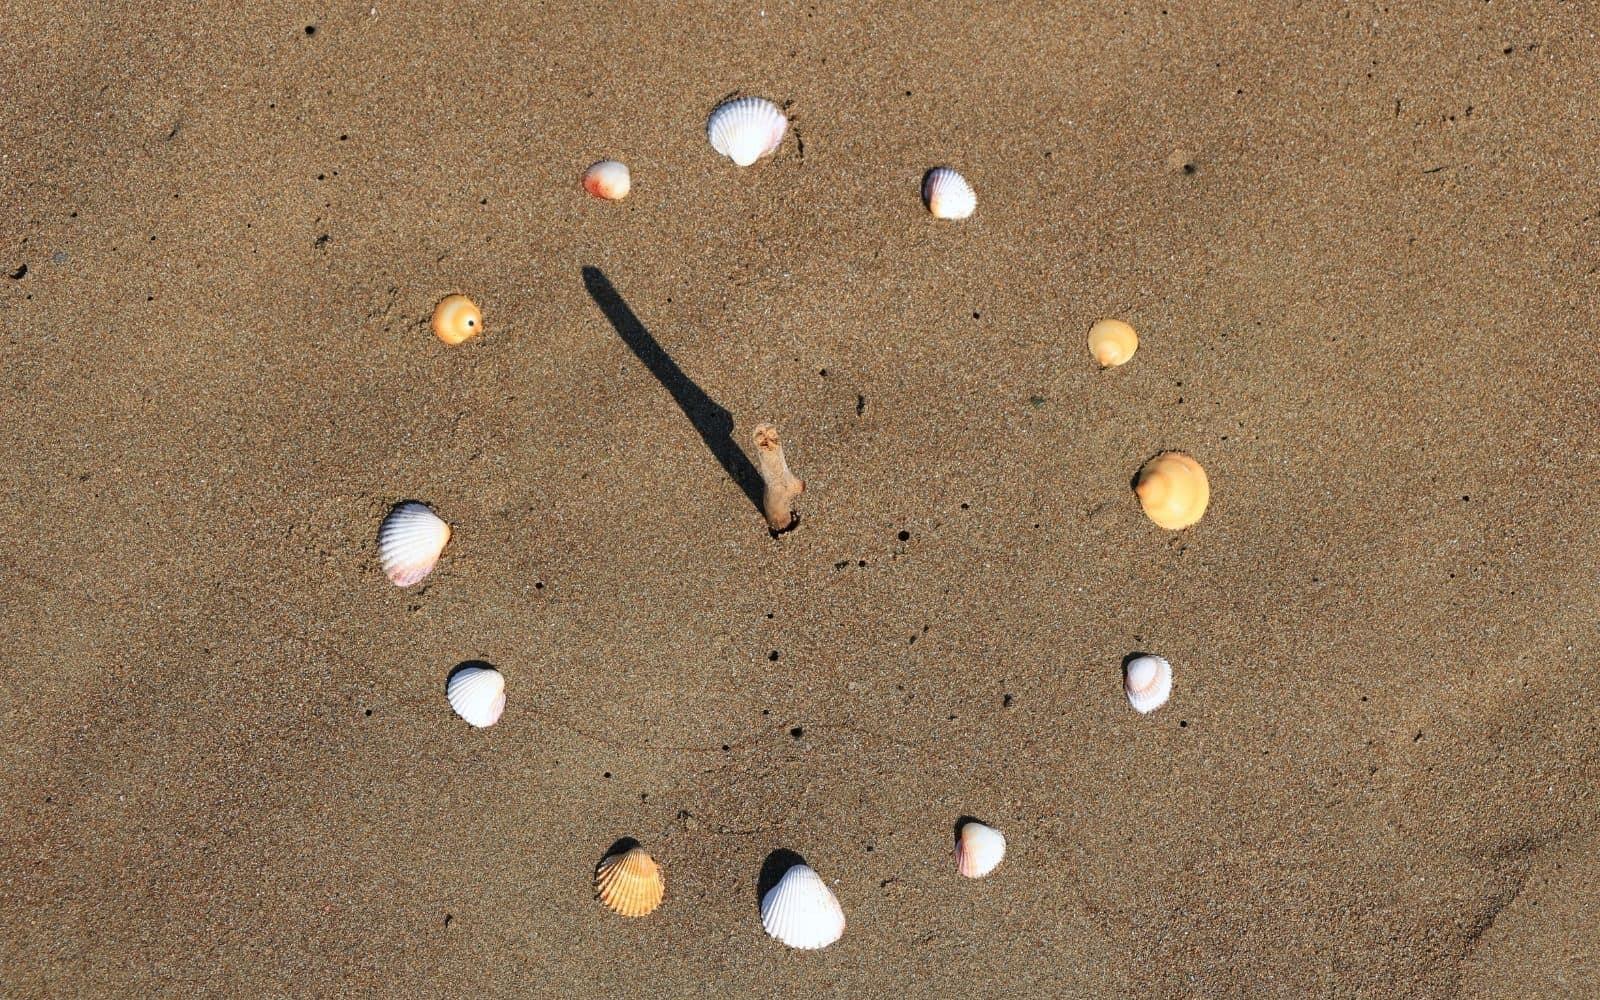 preschool sundial activity - STEM for toddlers